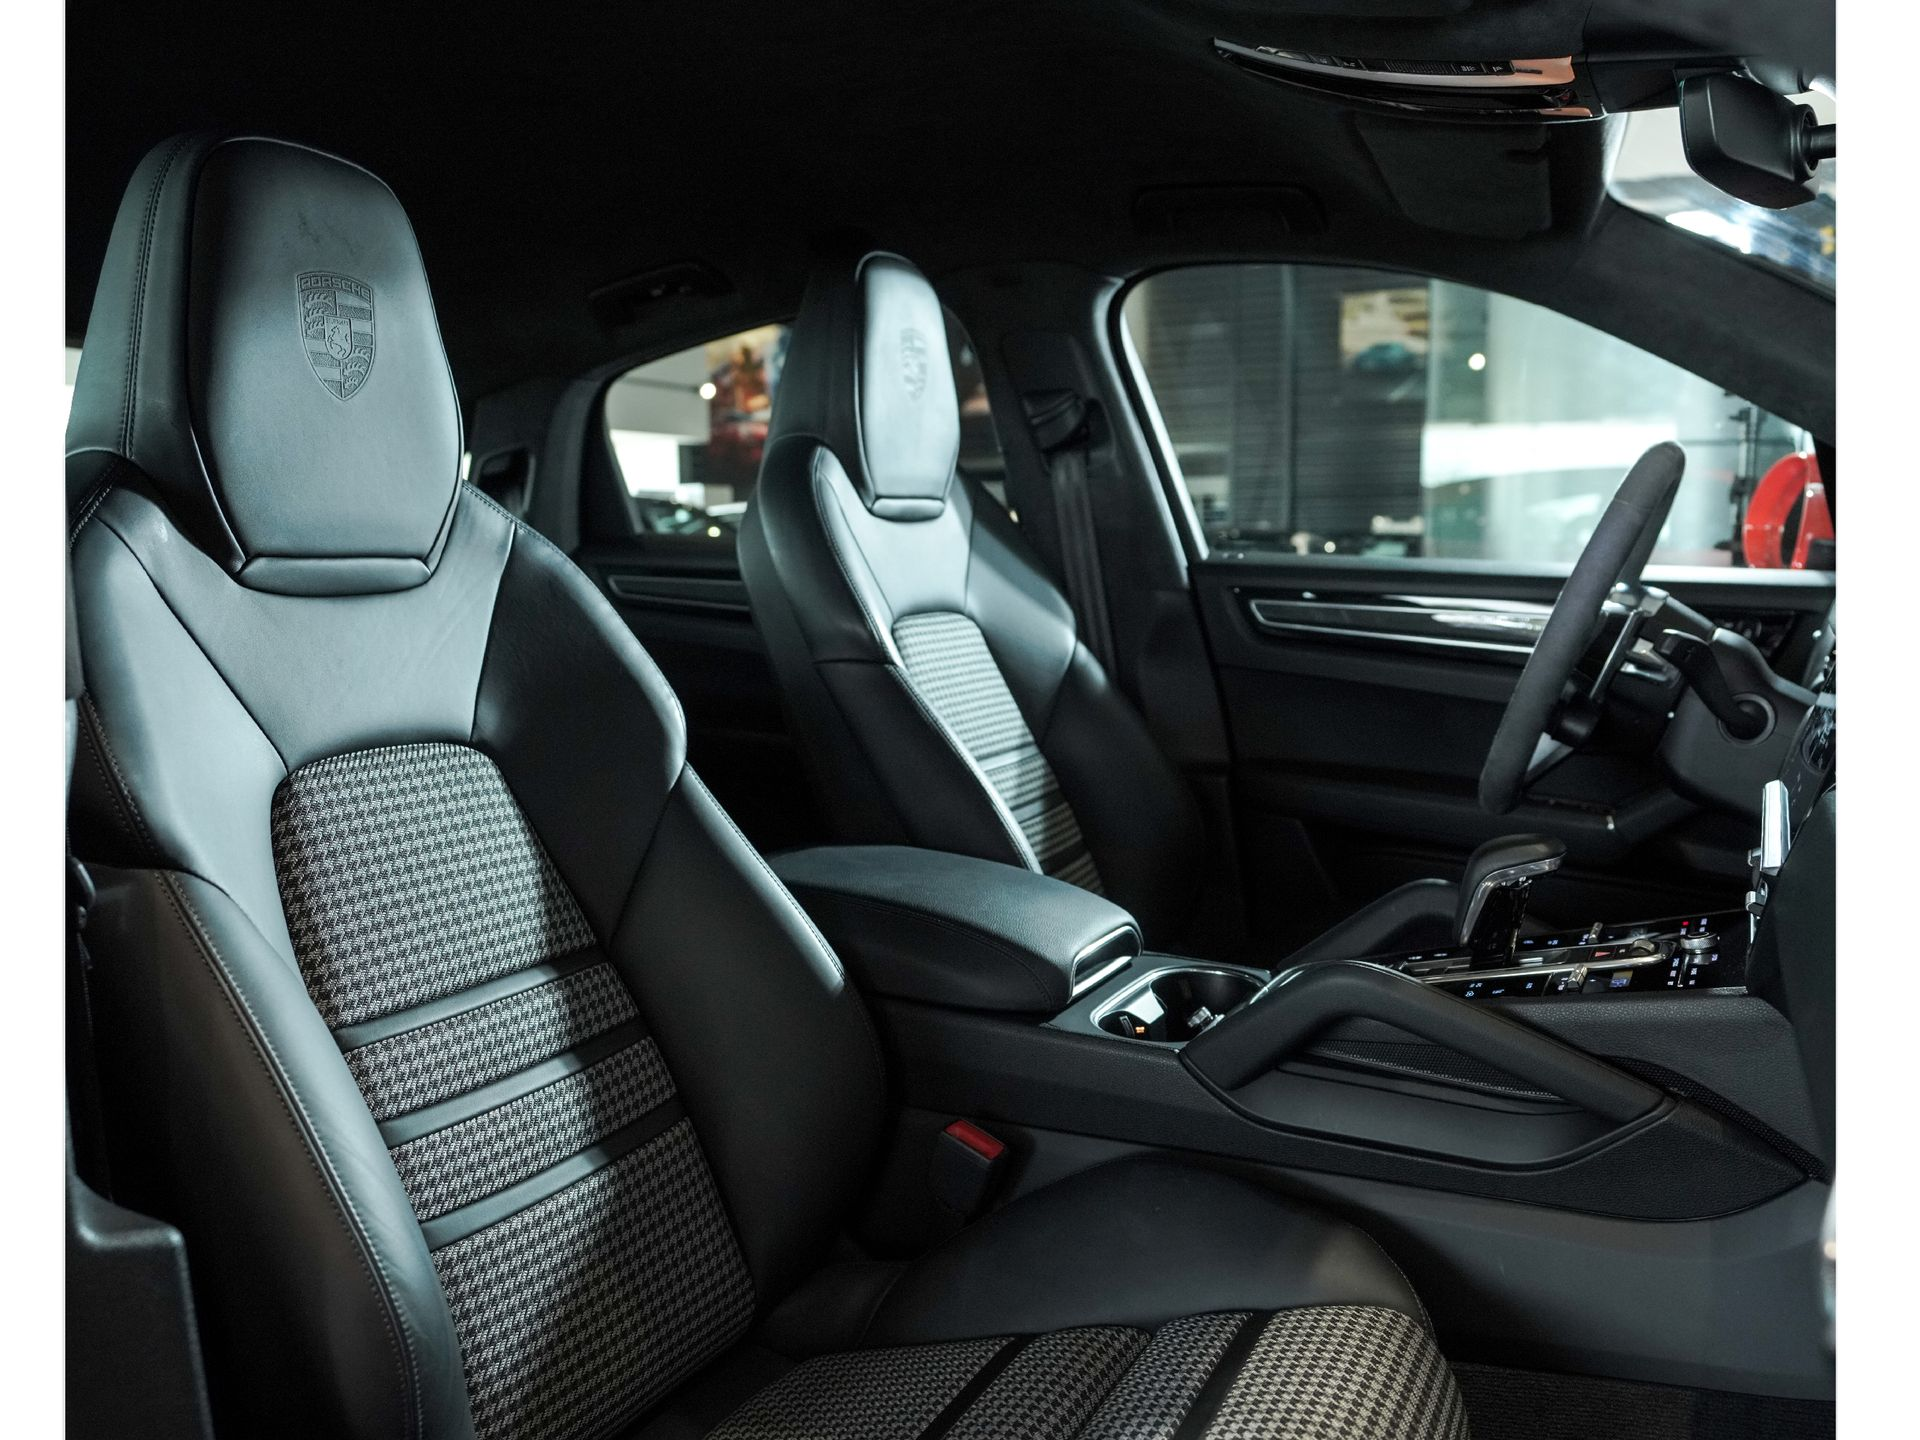 2020 Porsche Cayenne S Coupé – 3